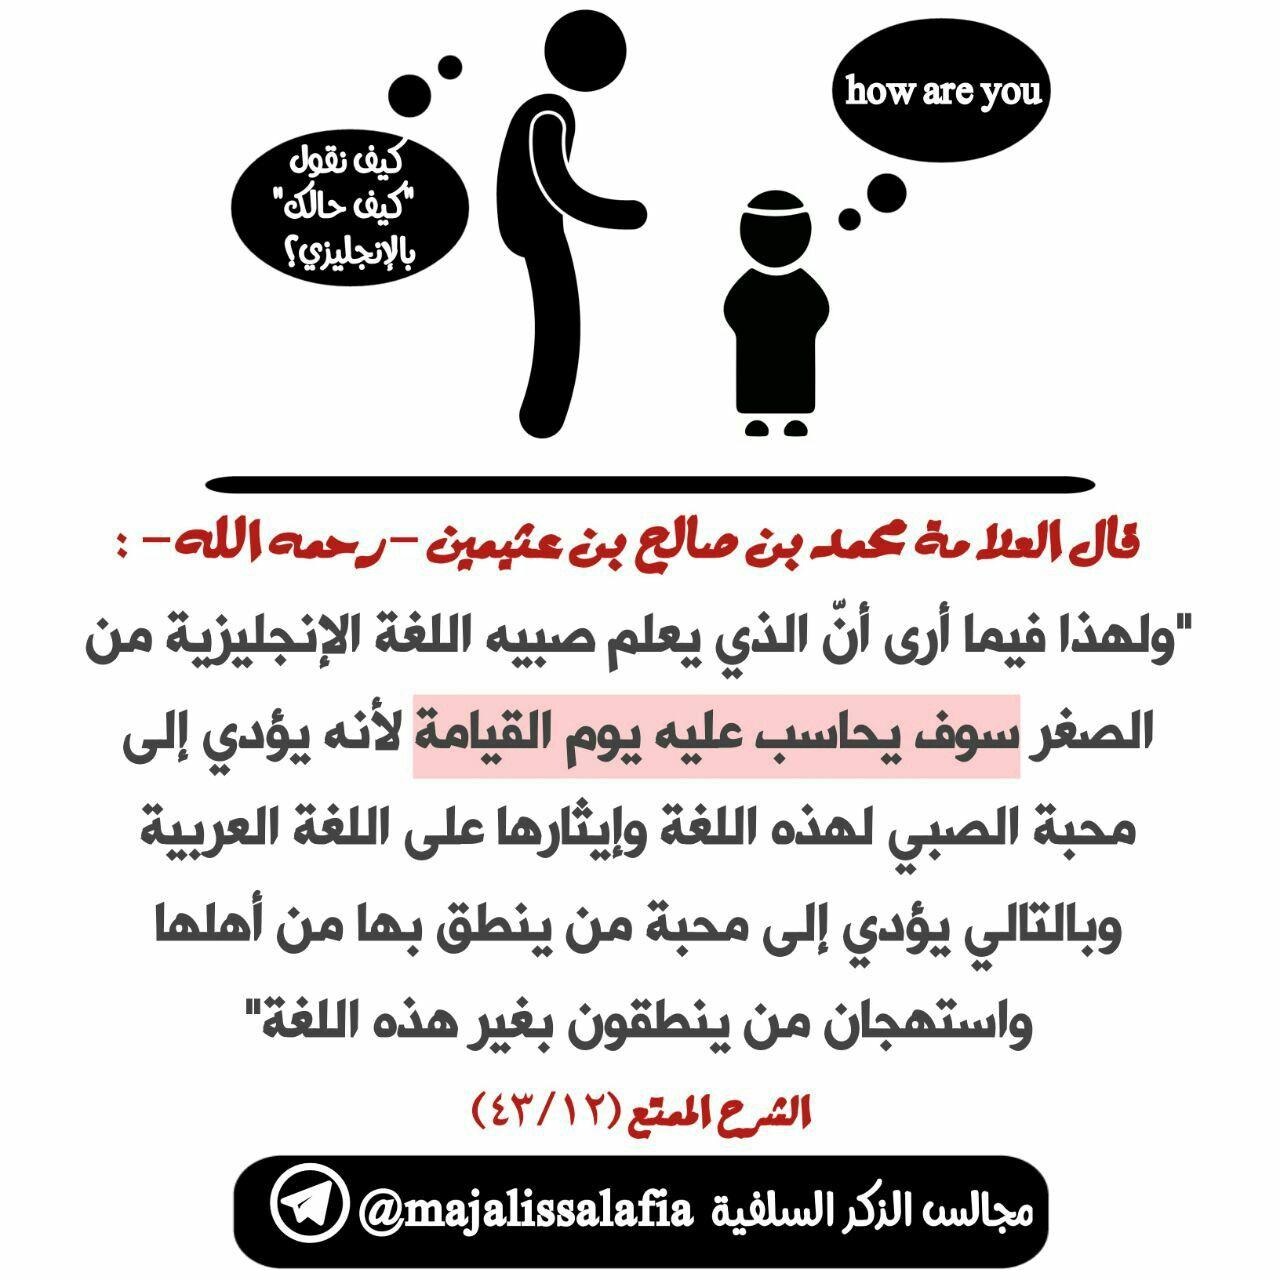 Pin By Vivo On تربية الأطفال Islam Hadith Hadith Islam